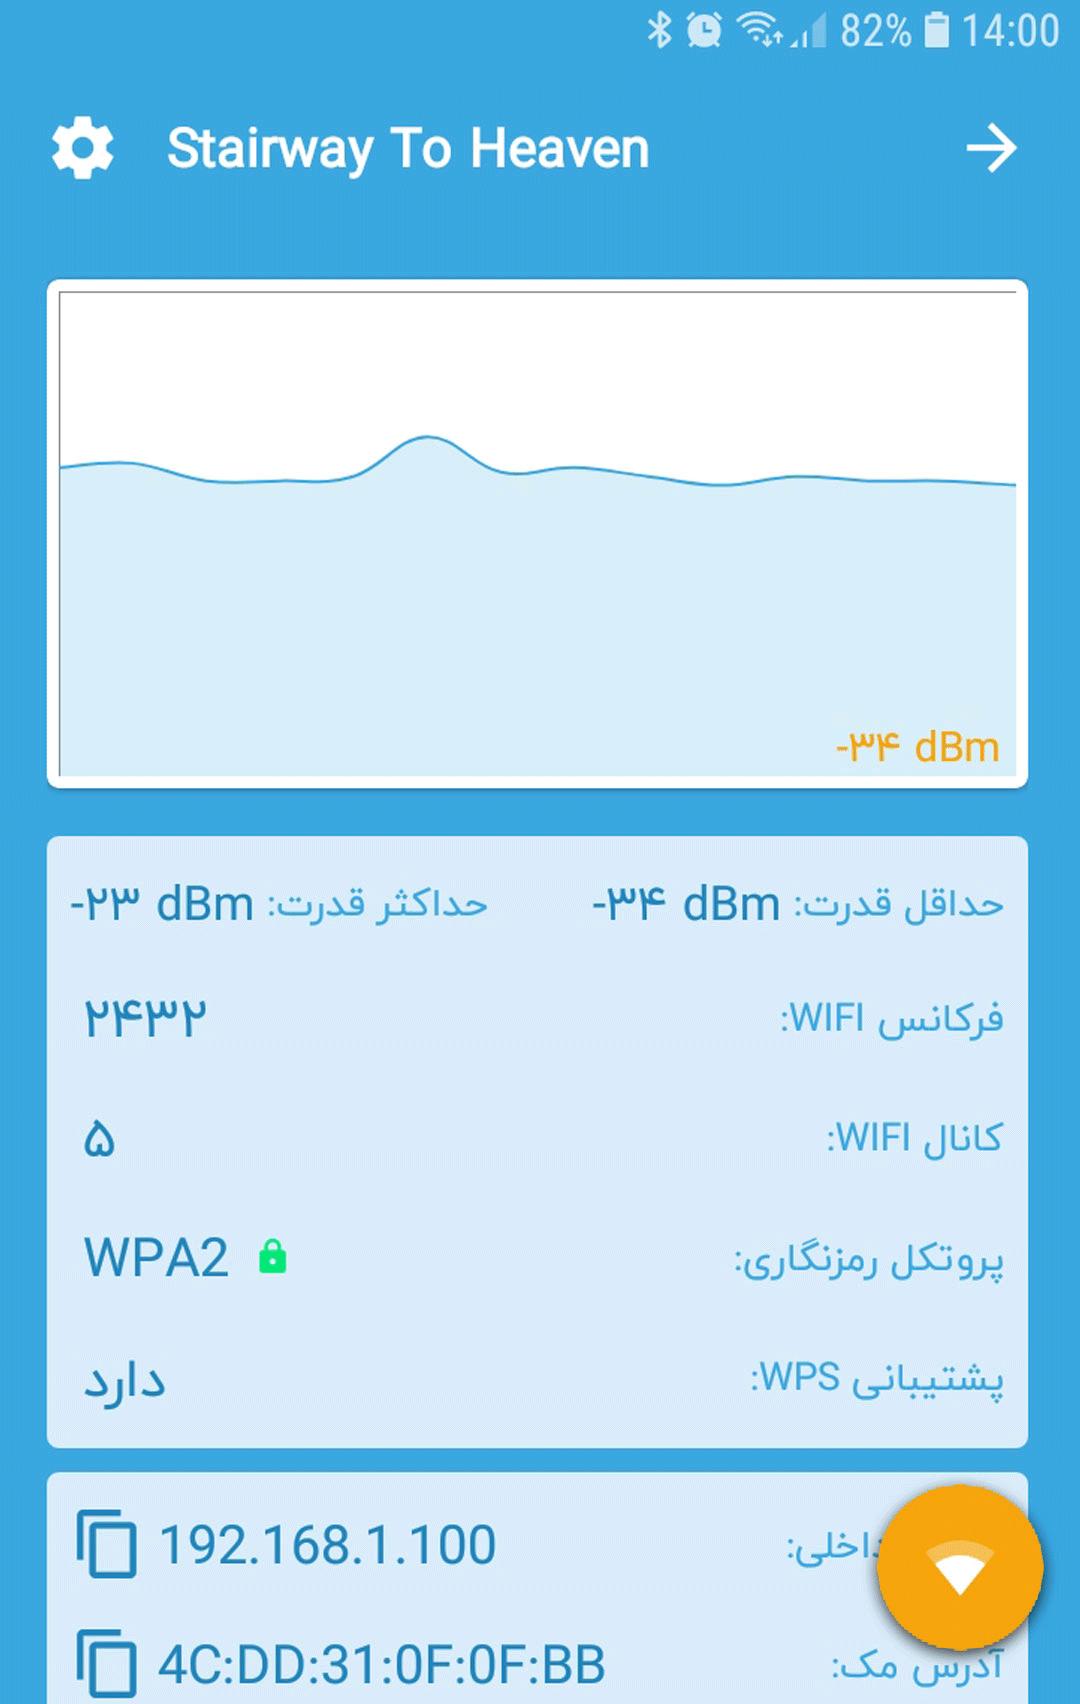 تصویر 4 تست سیگنال WIFI